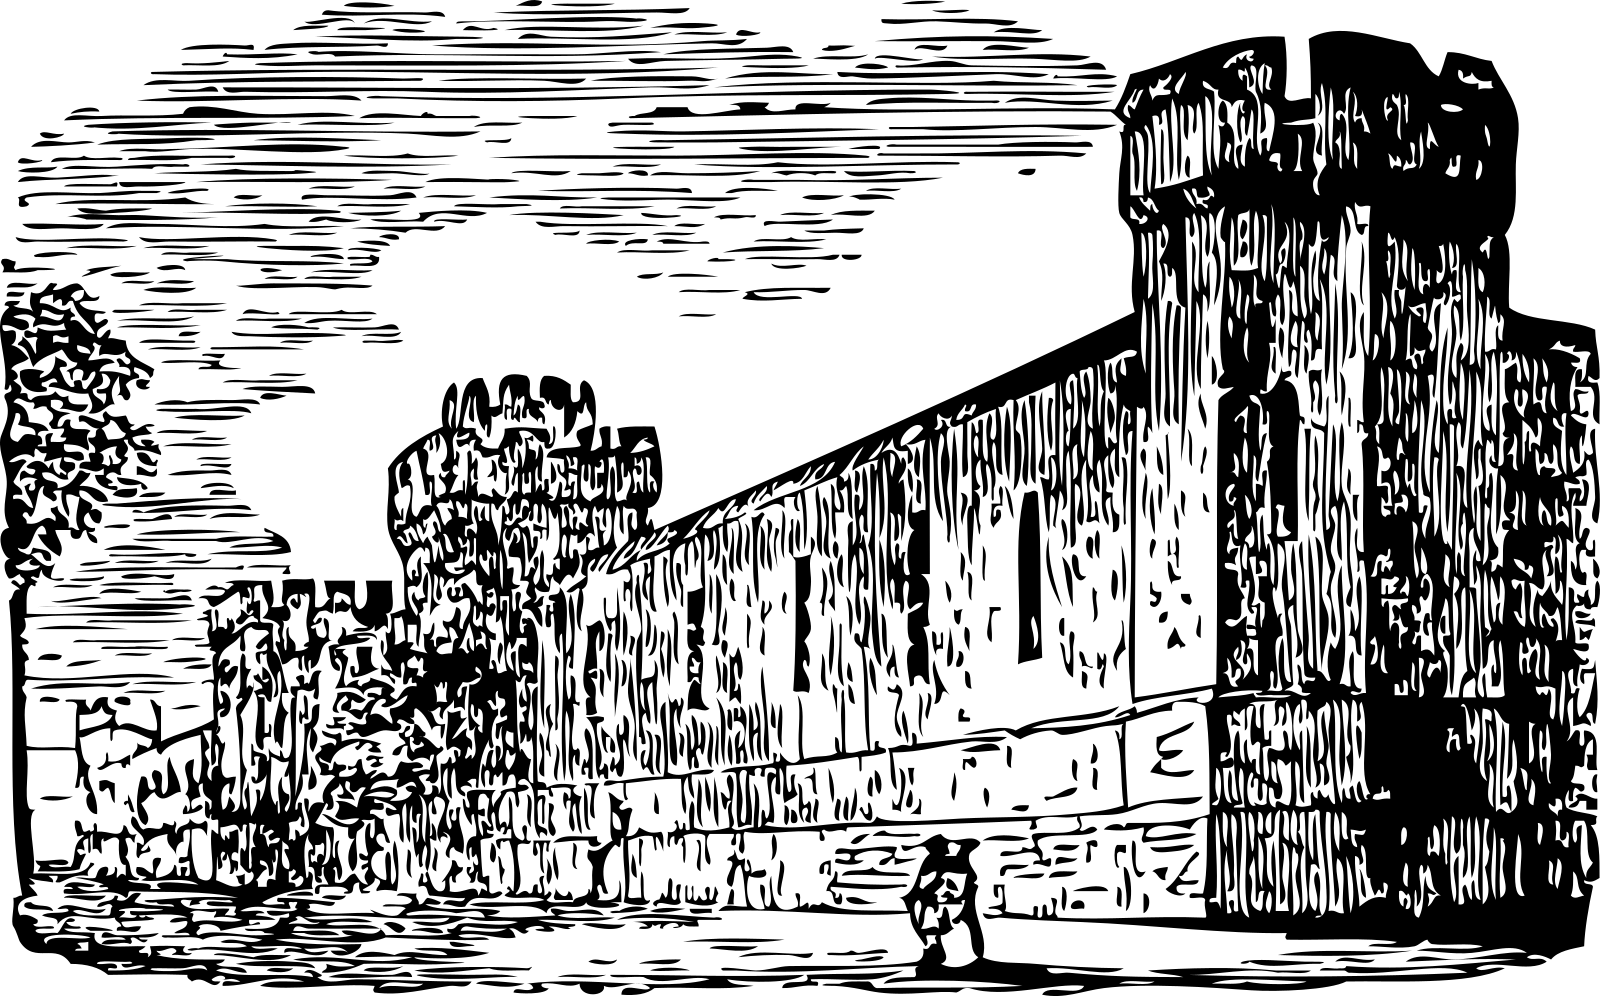 Nc State SVG Clip arts